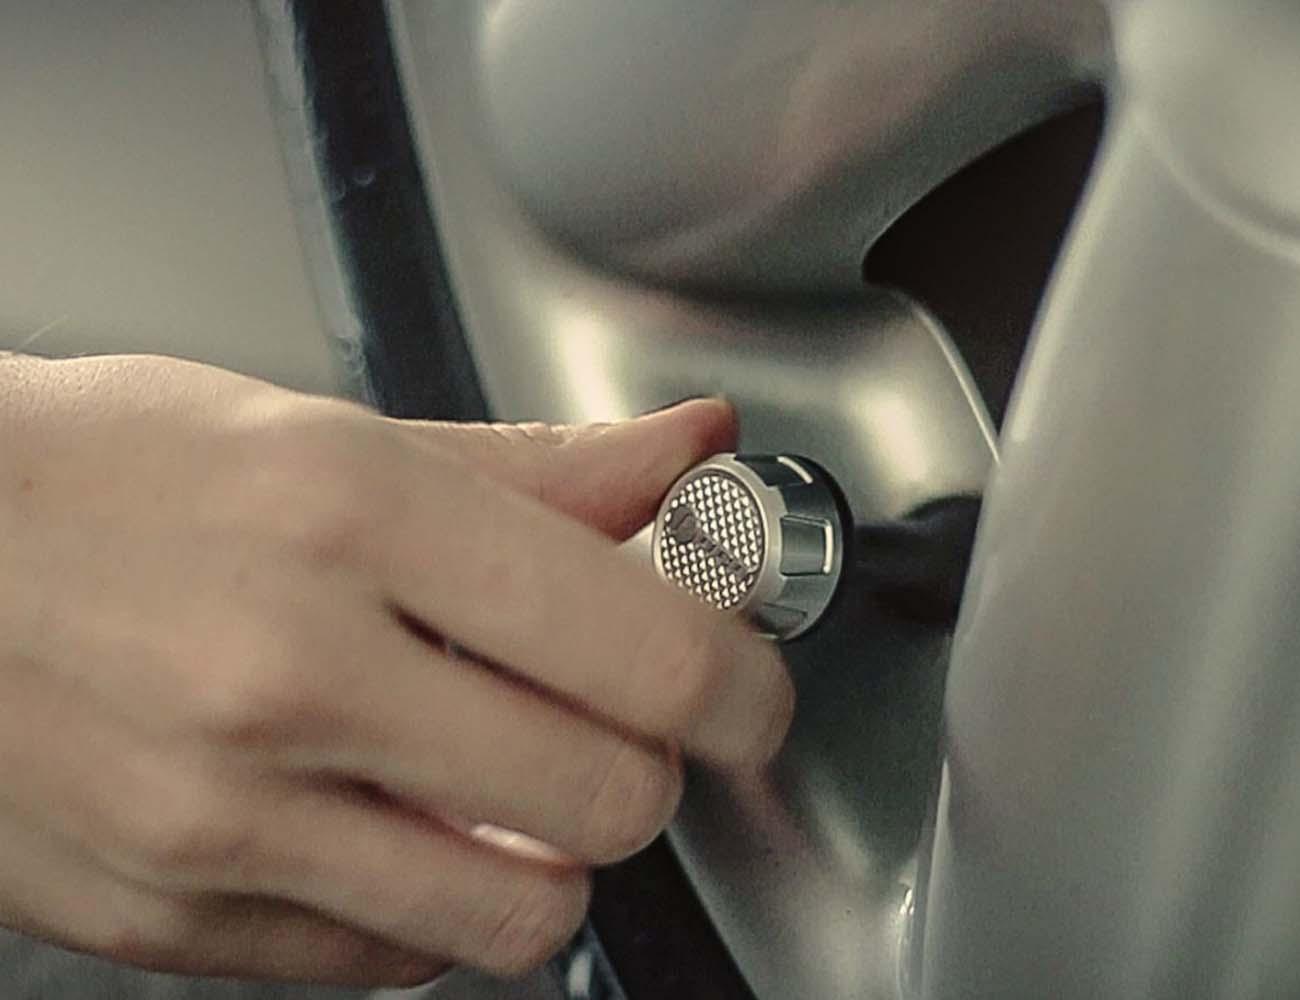 FOBO Bike – Bluetooth Smart Tire Pressure Monitoring System